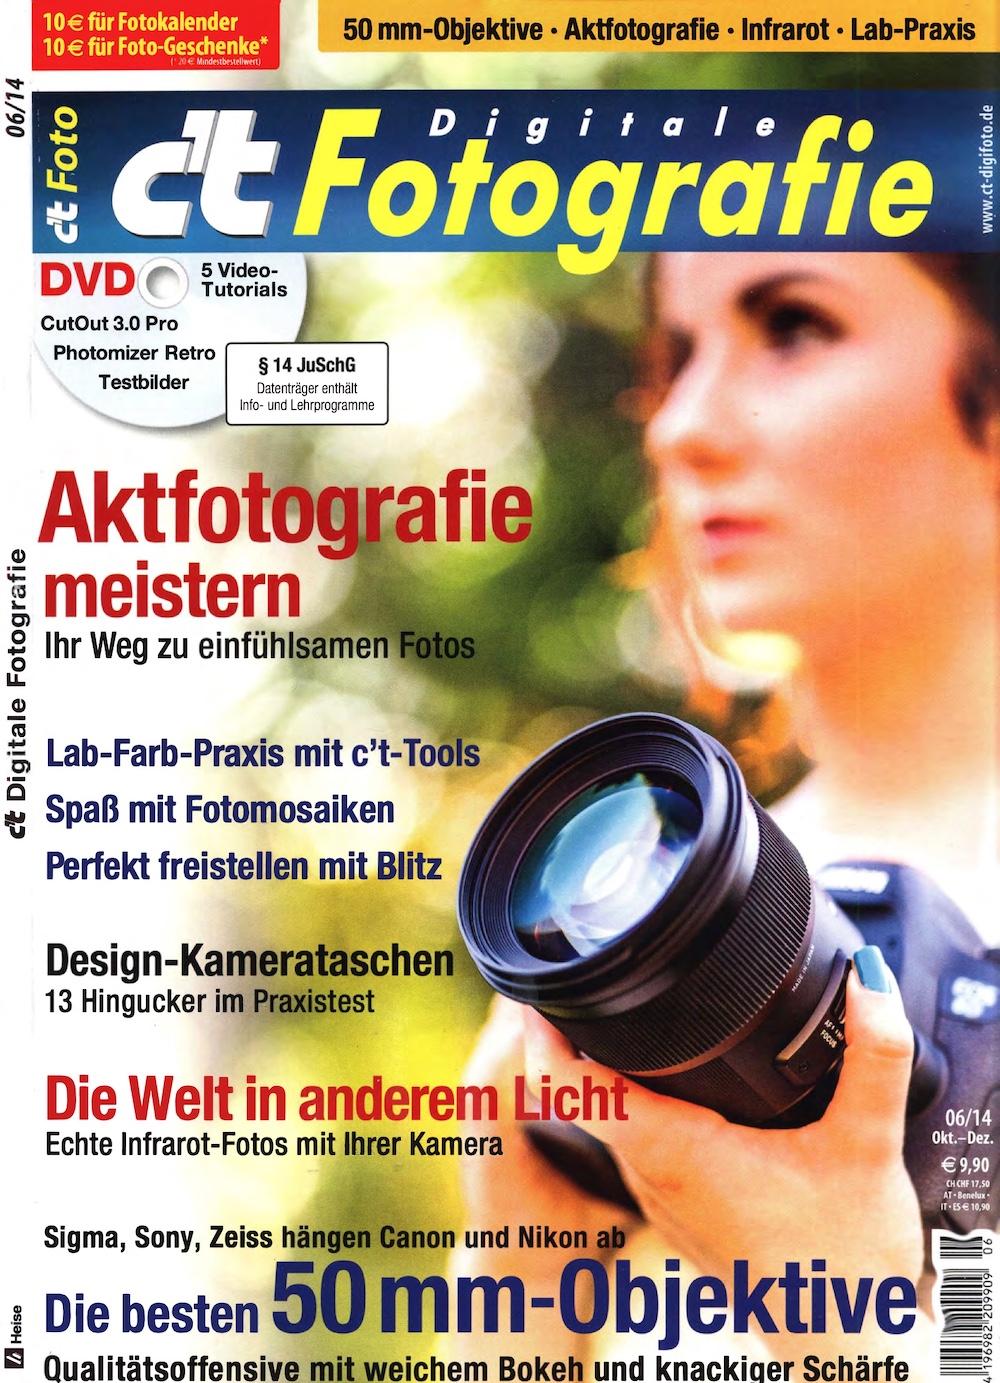 c't Digitale Fotografie 2014-06